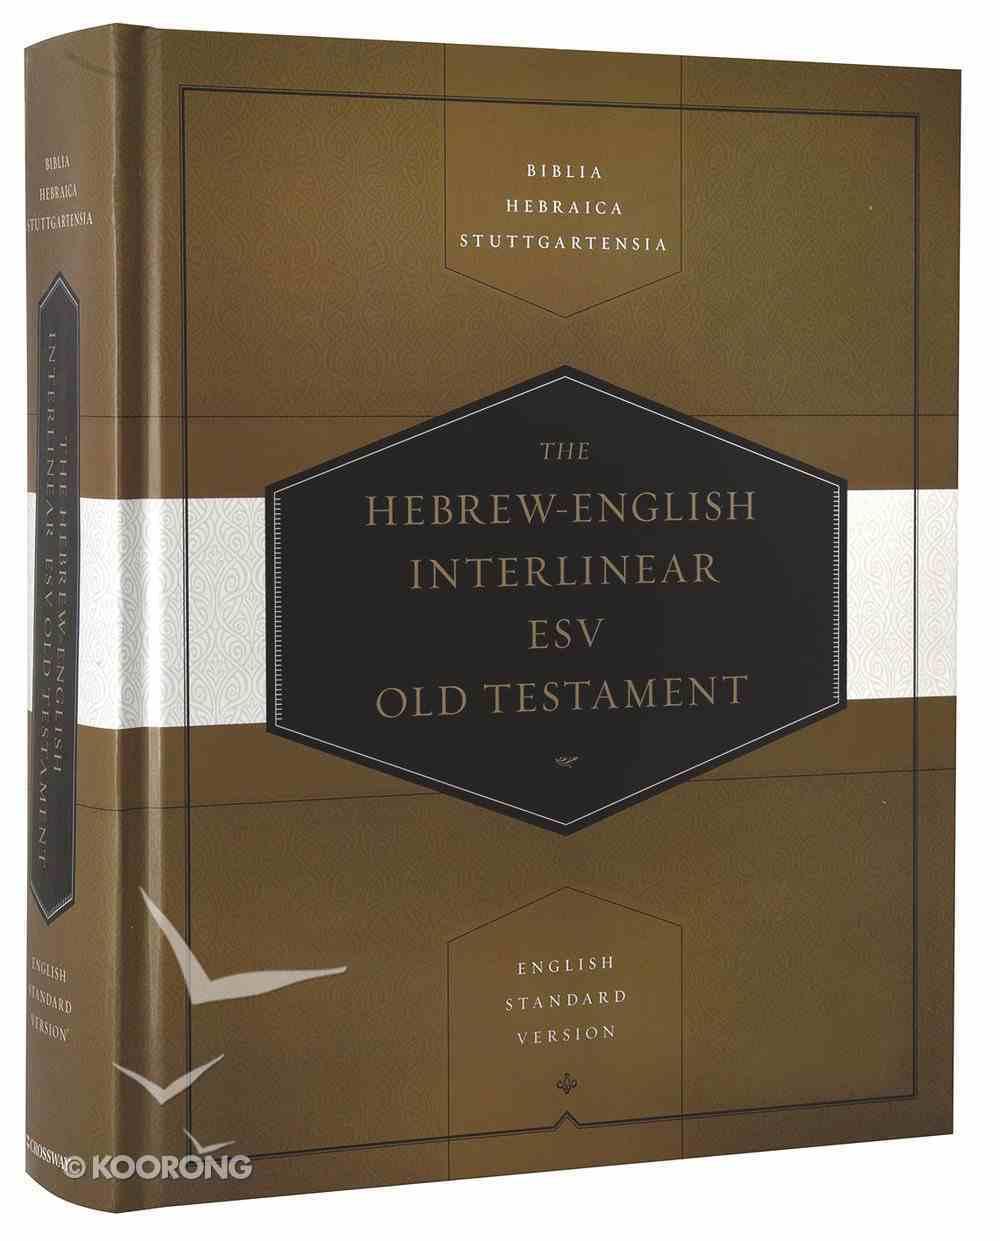 Hebrew-English Interlinear ESV Old Testament: Biblia Hebraica Stuttgartensia and English Standard Version (ESV) (Bhs) Hardback